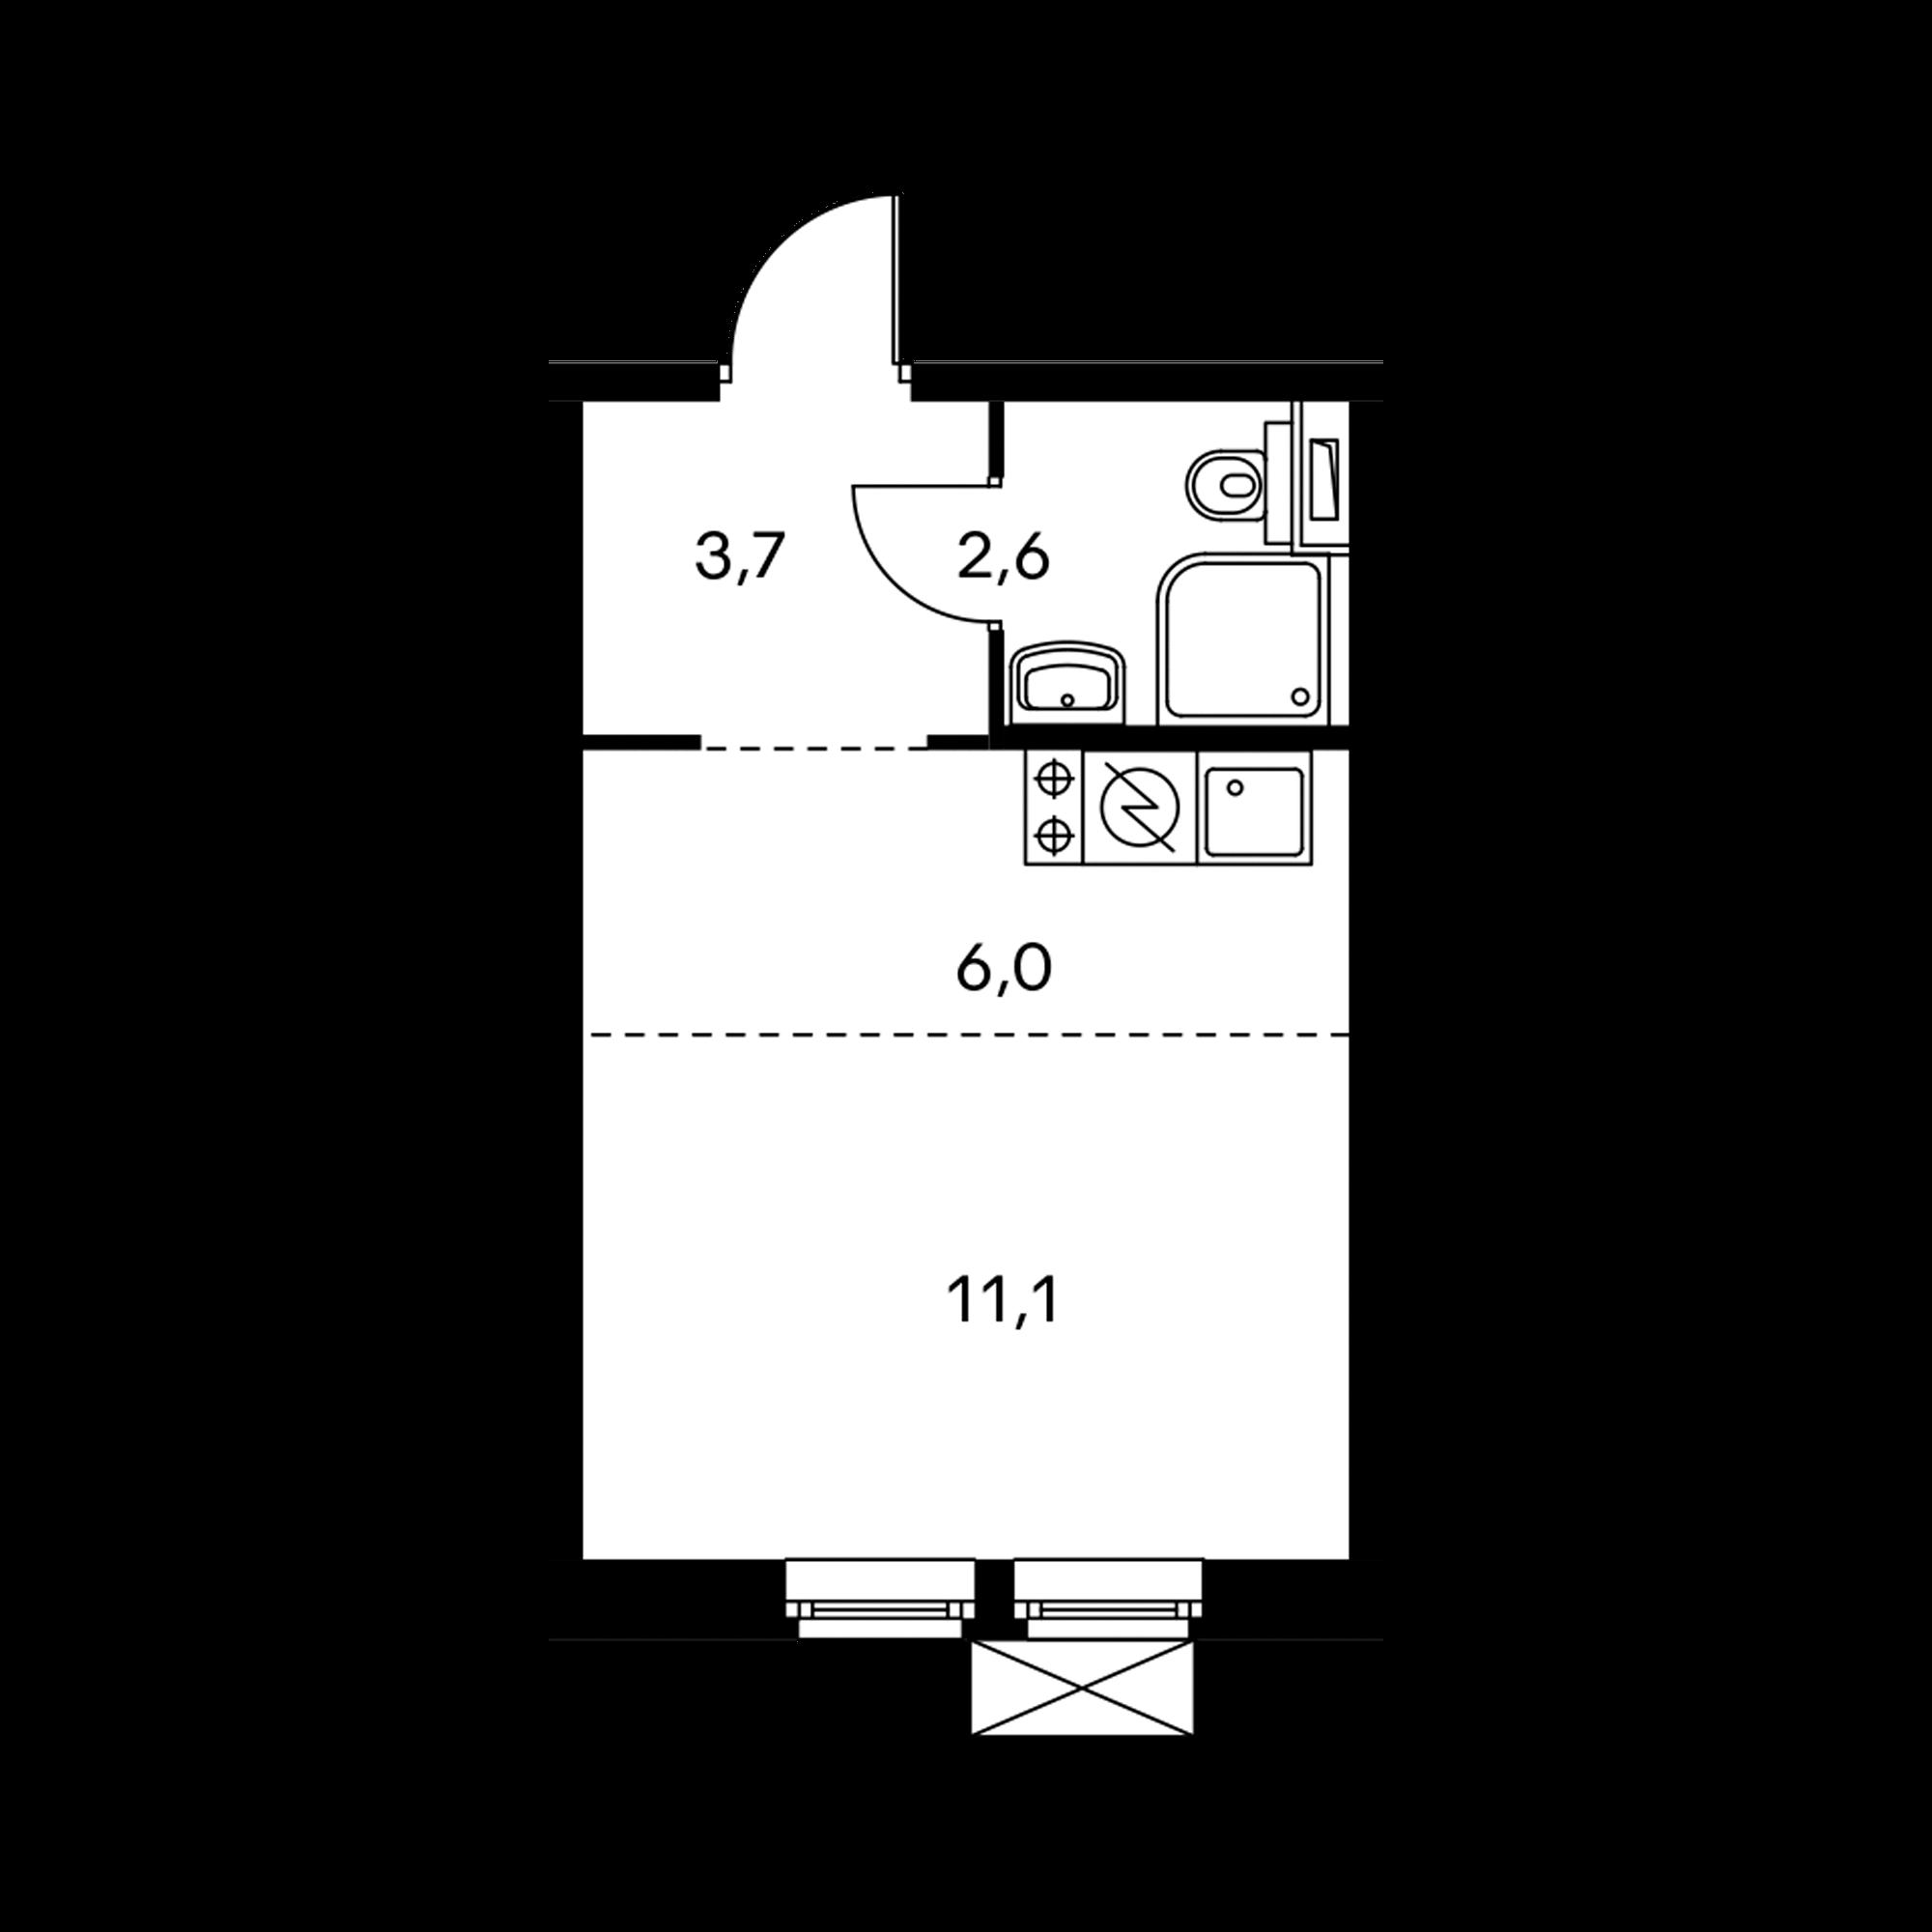 1NS1_4.2-3